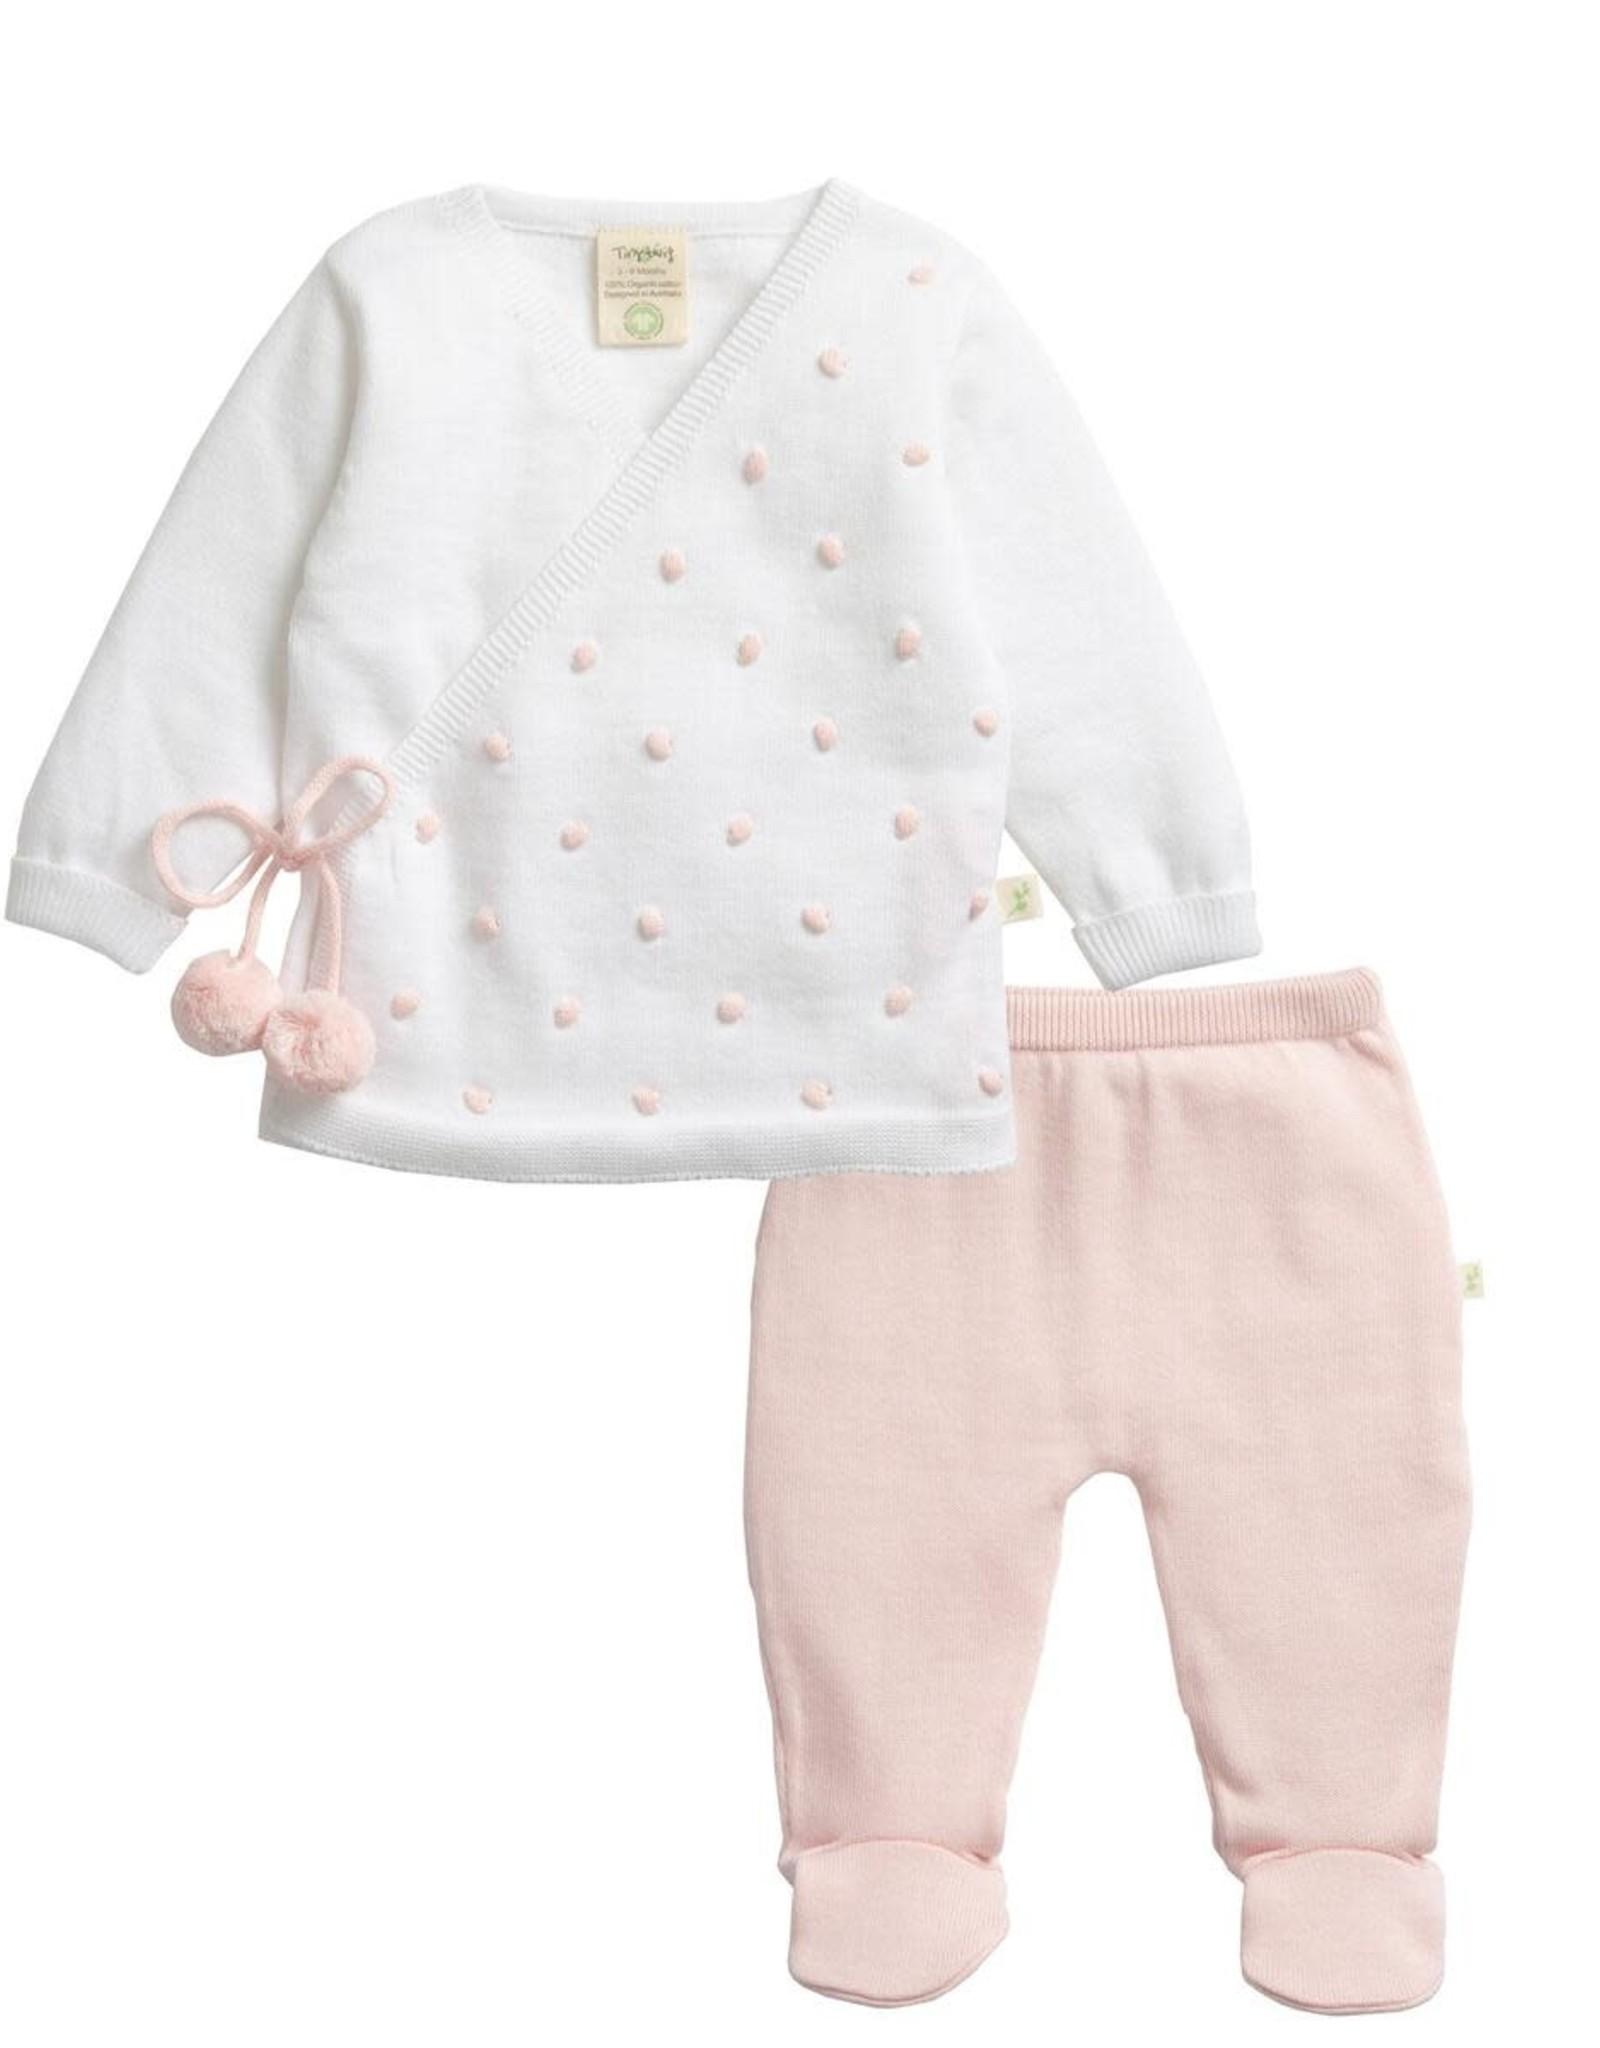 Tiny Twig White & Soft Pink Knitted Kimono Set